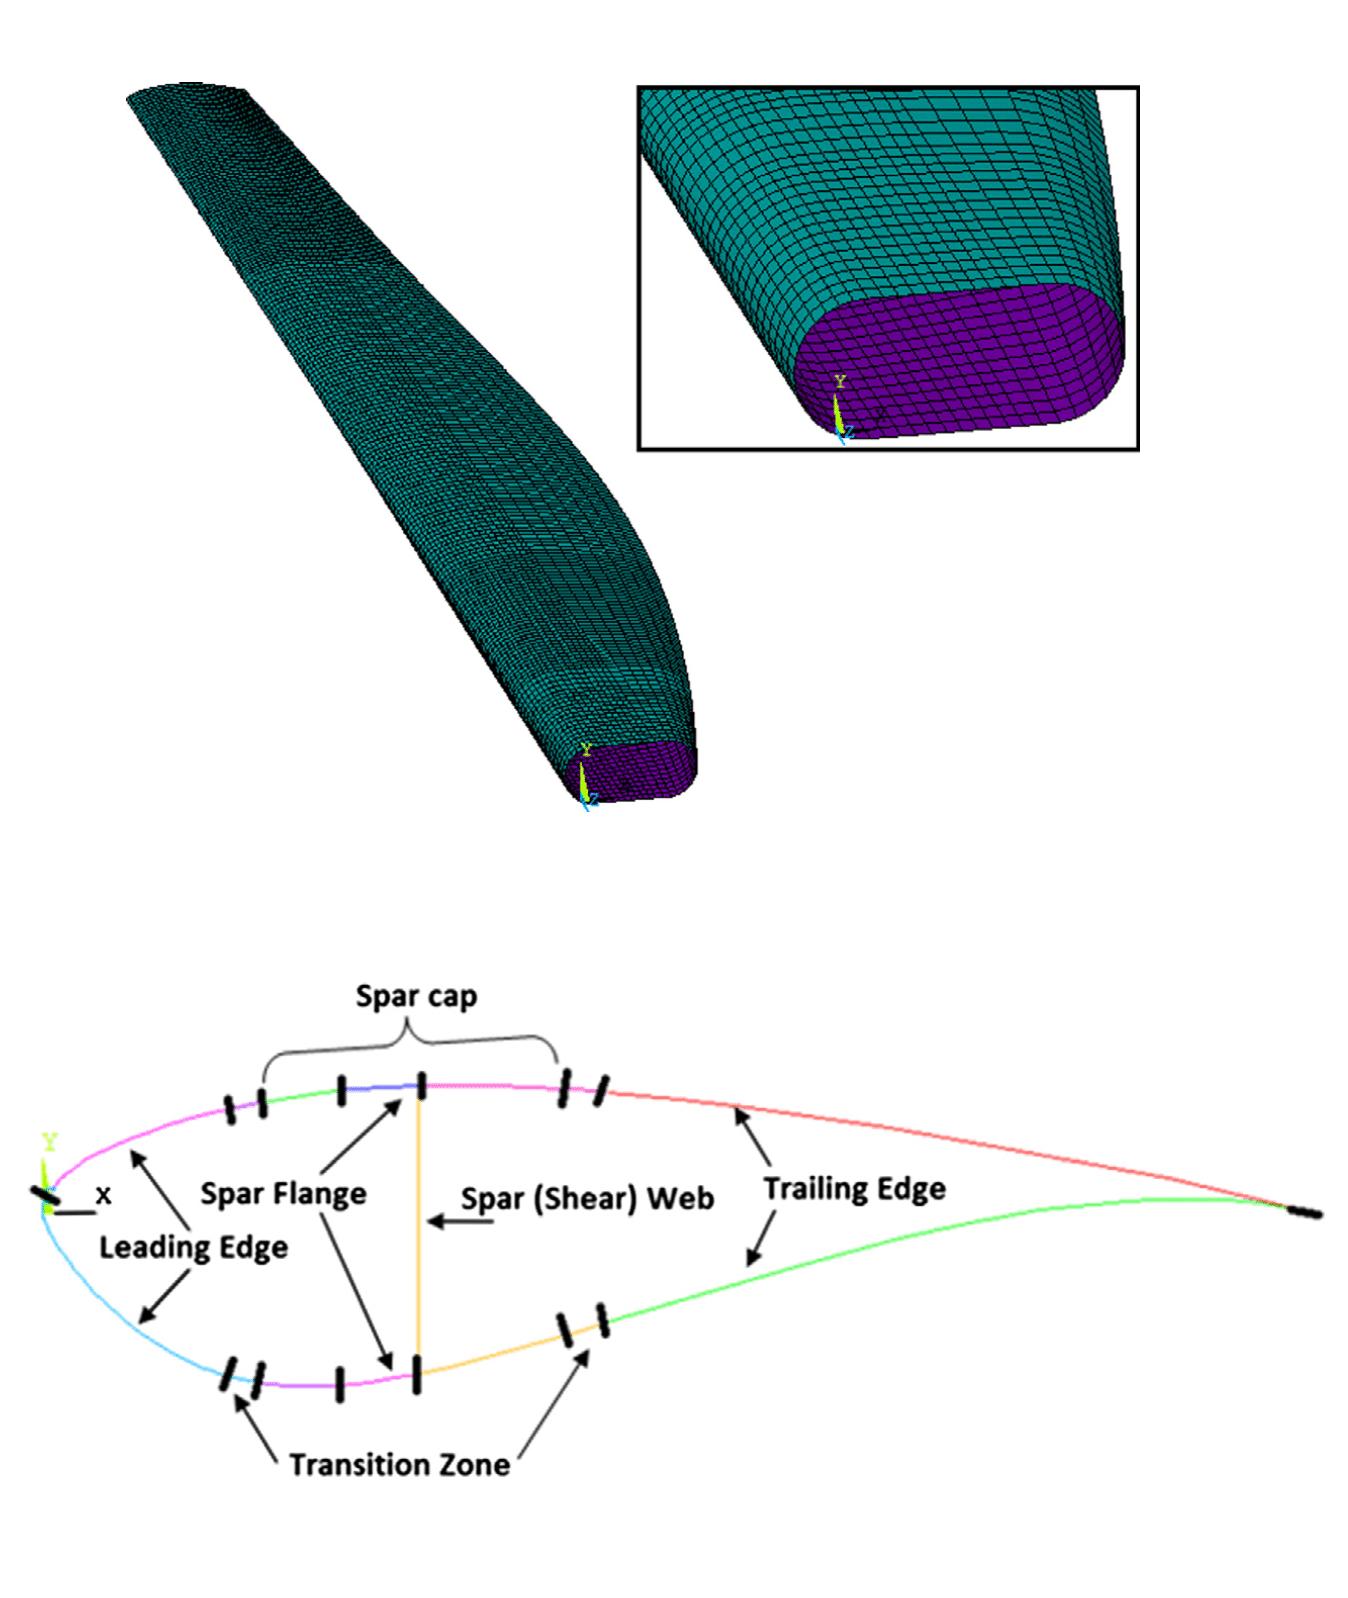 Horizontal-axis wind turbine HAWT